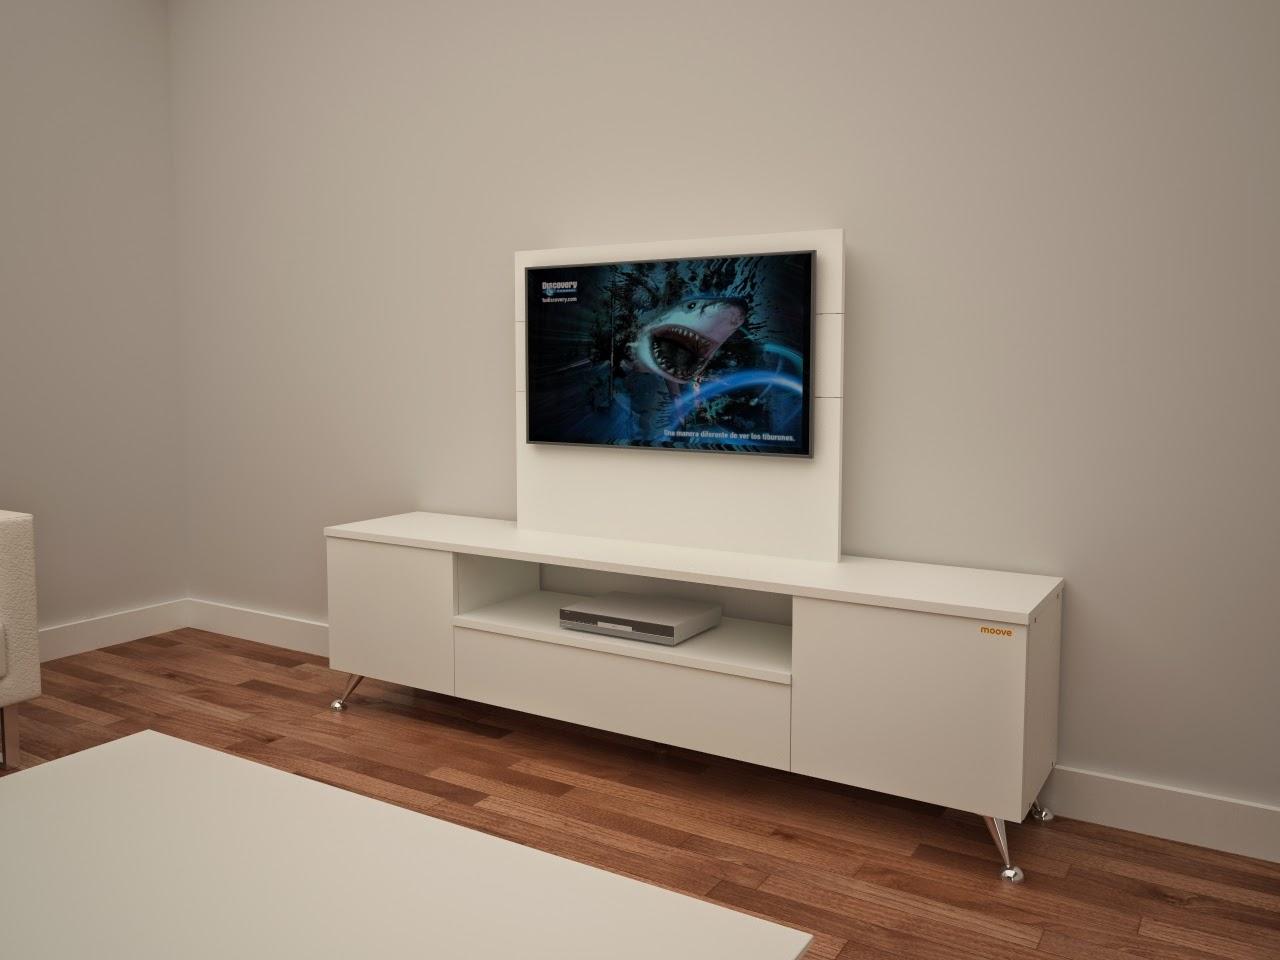 Muebles de dise o composici n 1 mueble para tv con fondo - Mueble ocultar tv ...